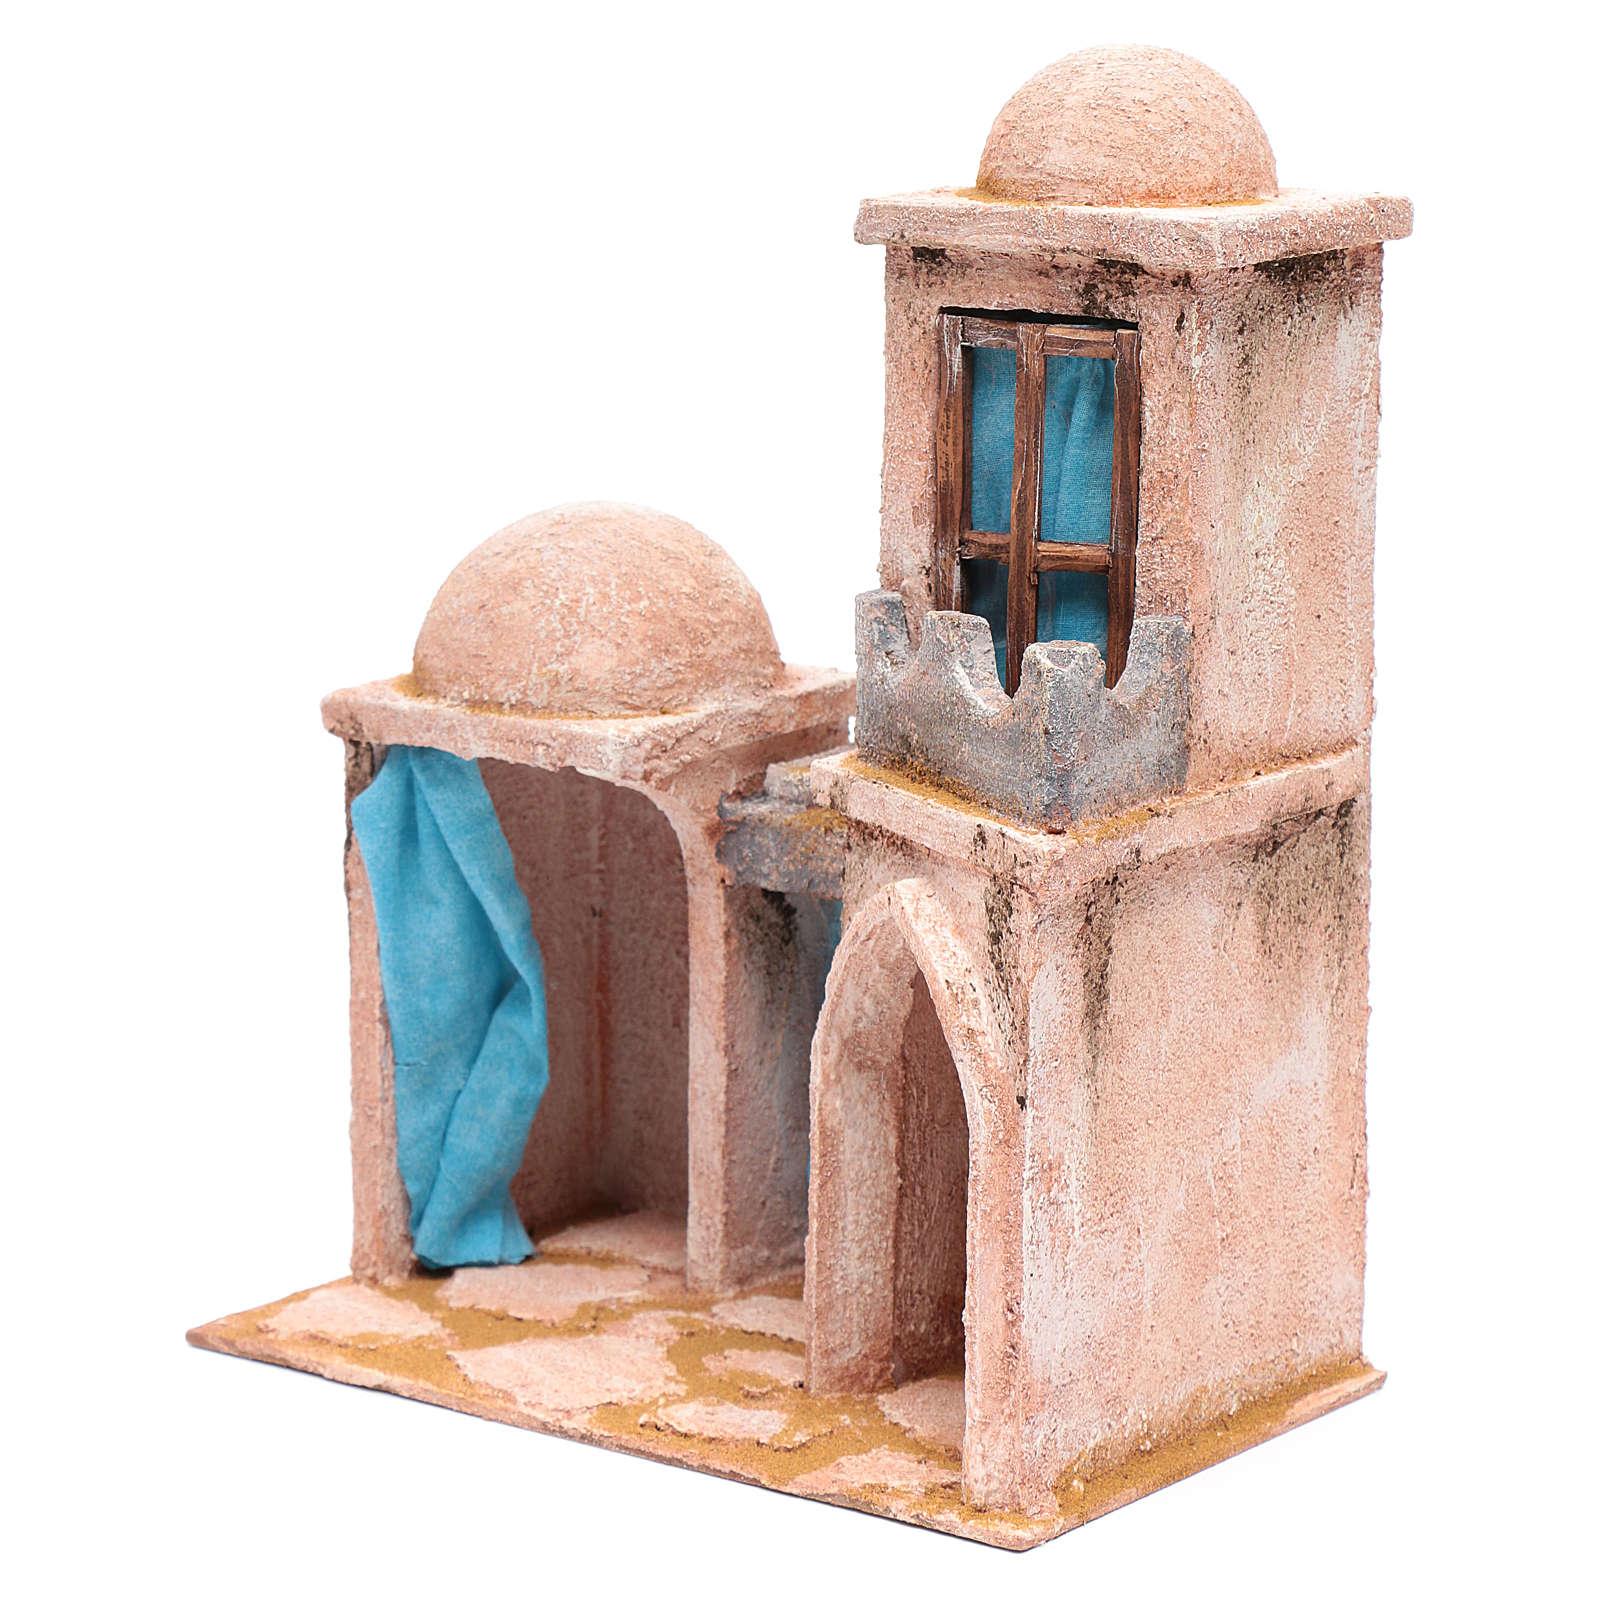 Casetta di stile arabo con balconcino 30x25x15 cm 4